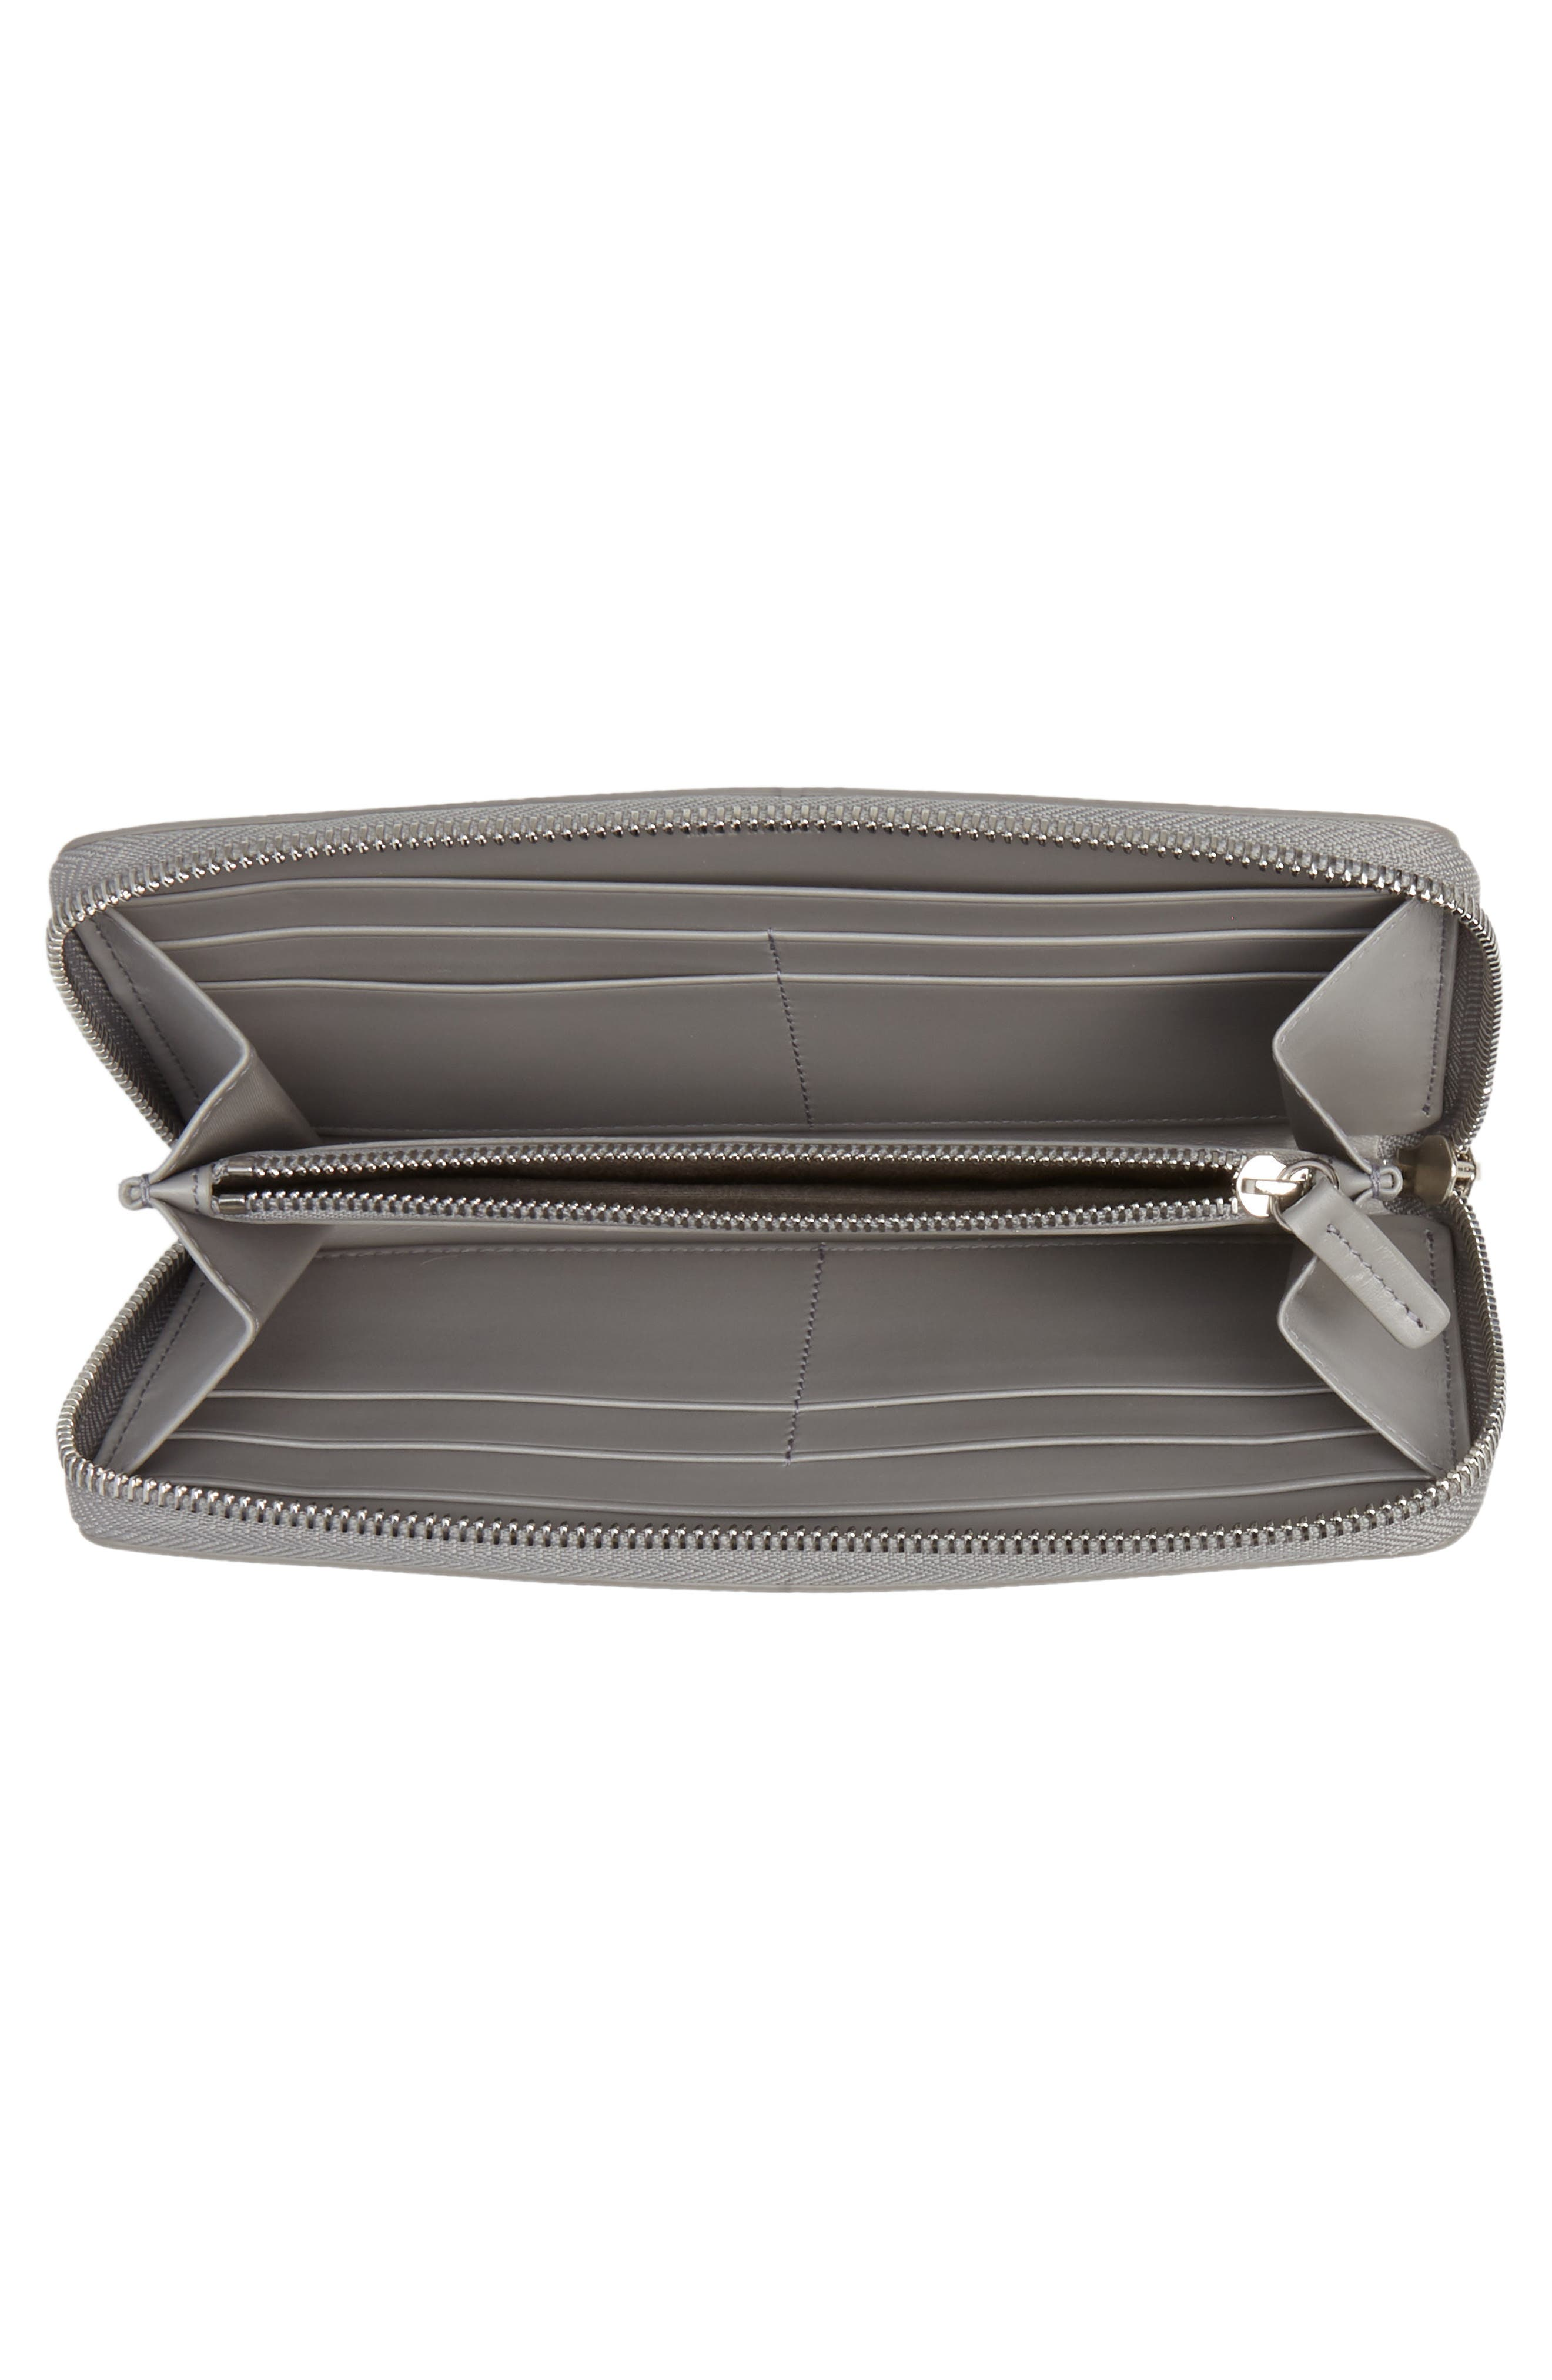 Large Panama Zip Around Wallet,                             Alternate thumbnail 2, color,                             Cold Grey